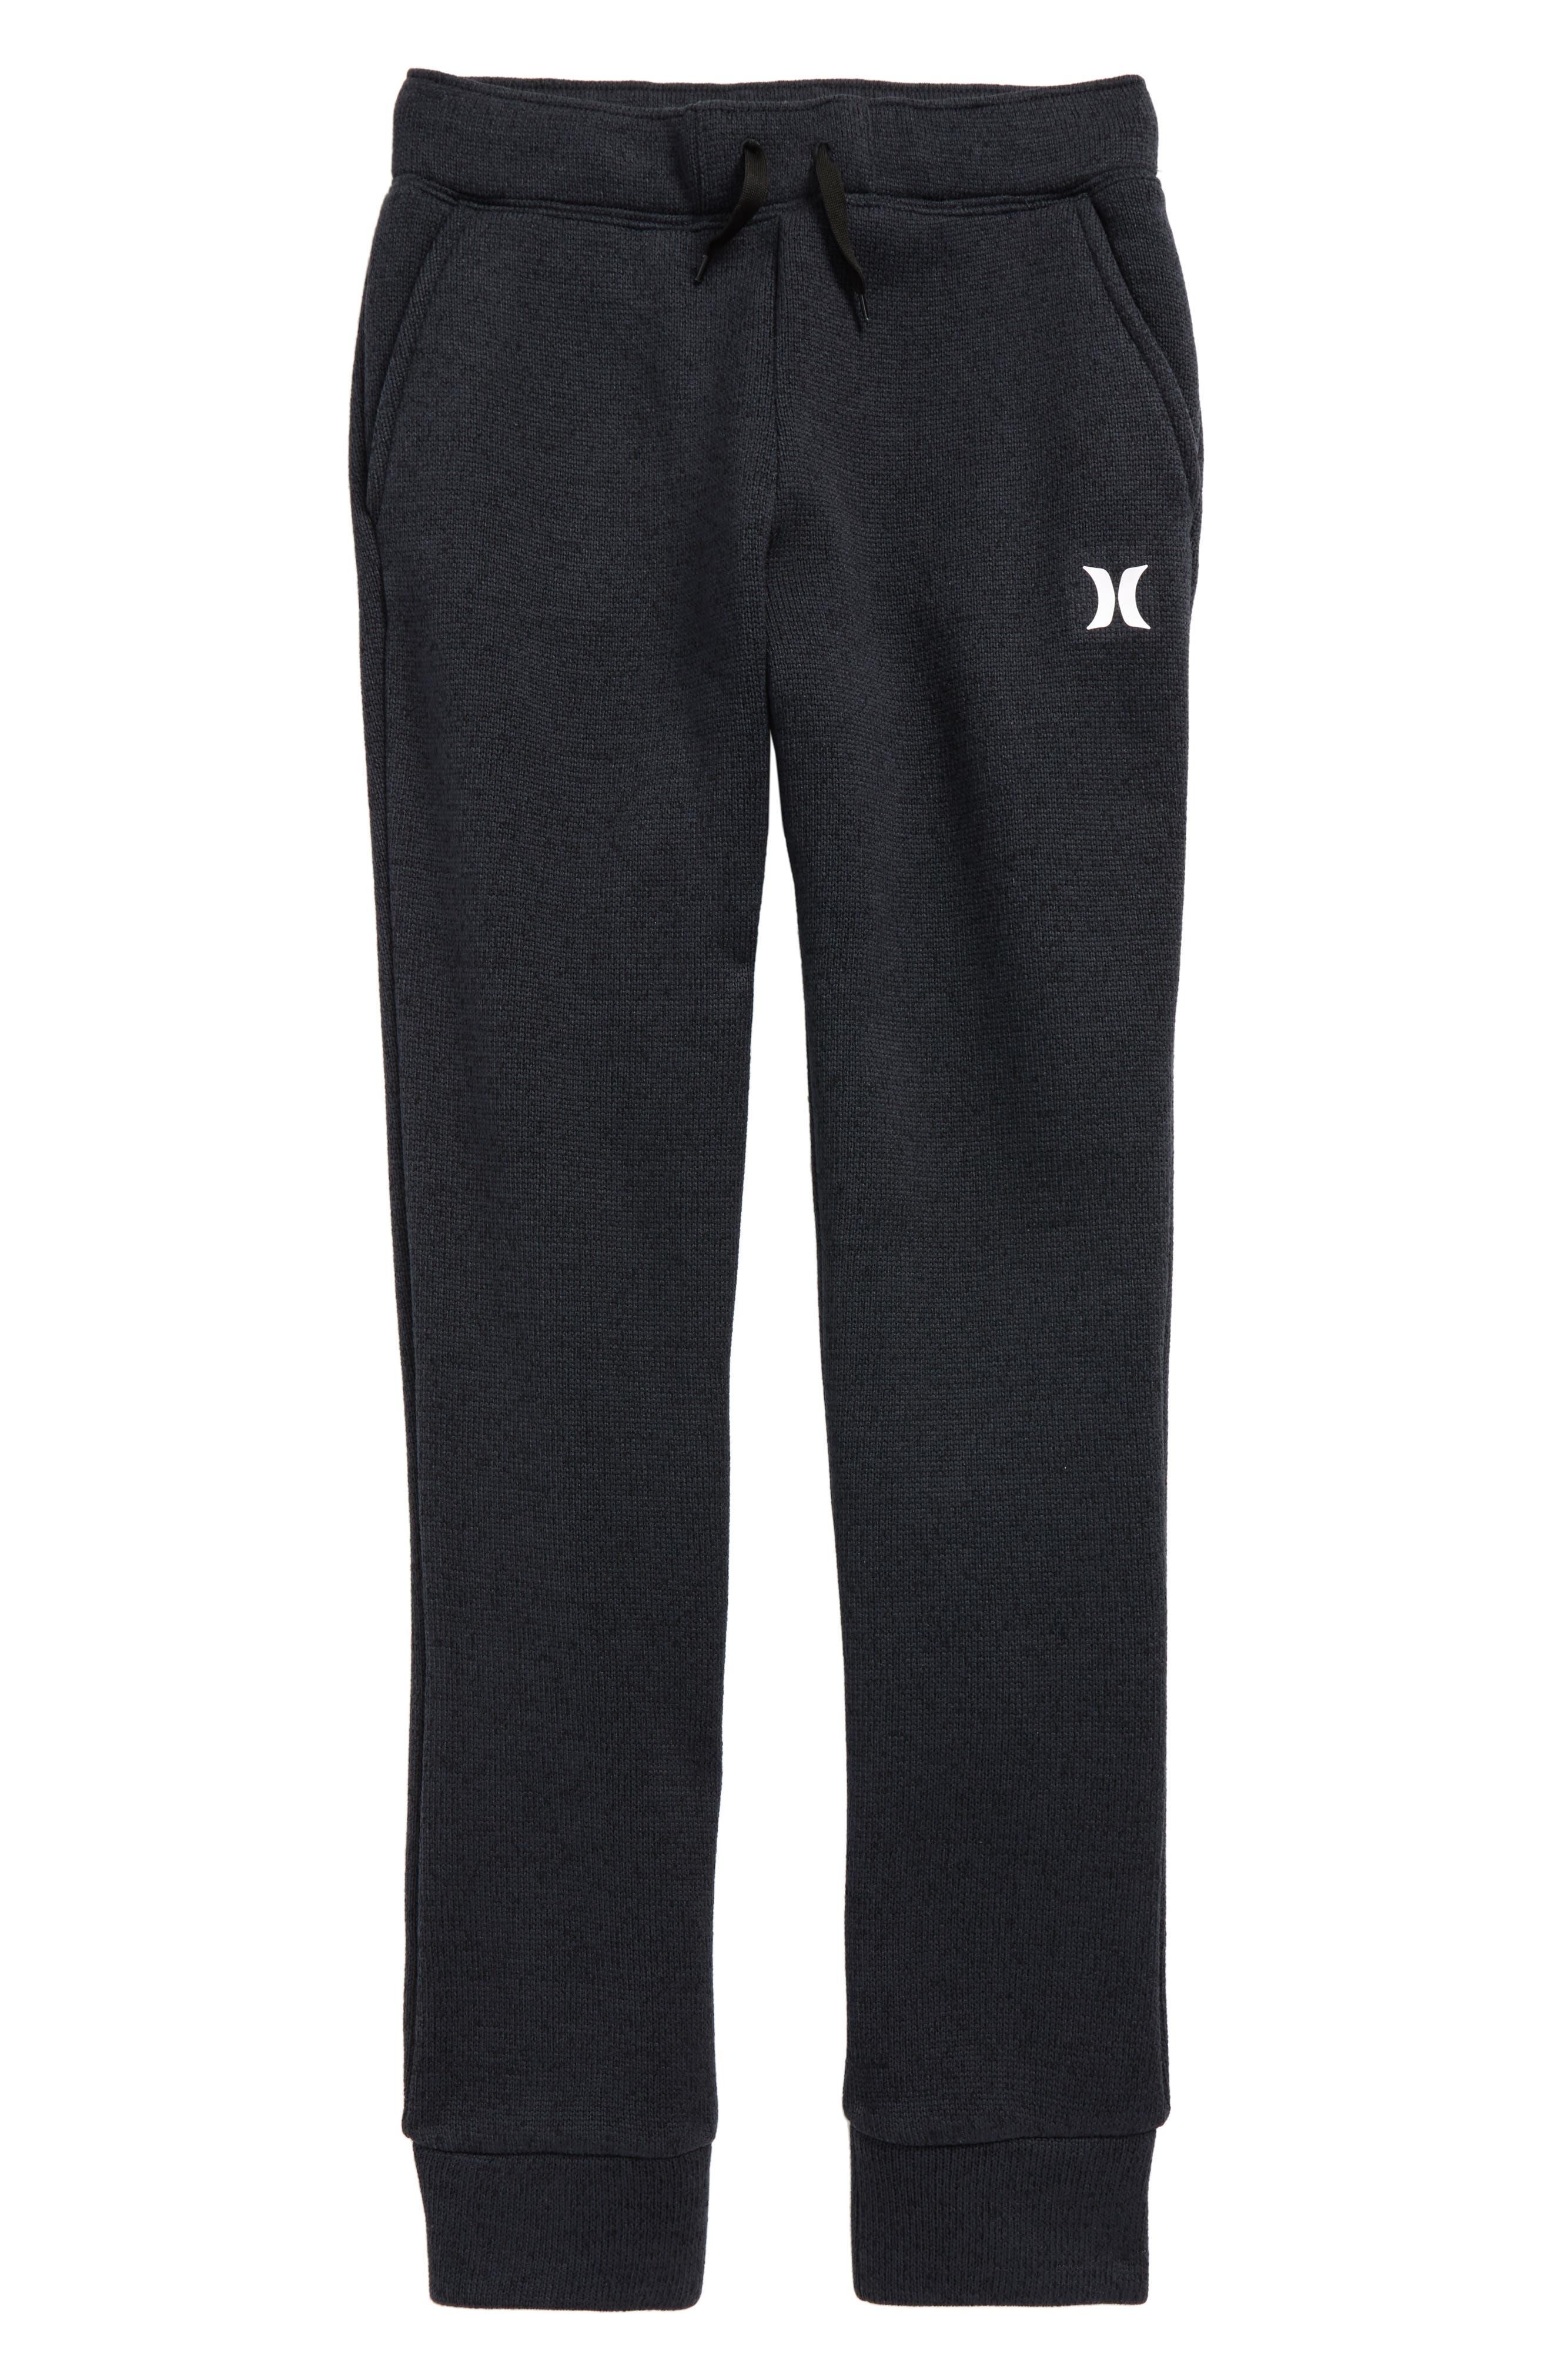 Sweater Knit Fleece Pants,                         Main,                         color,